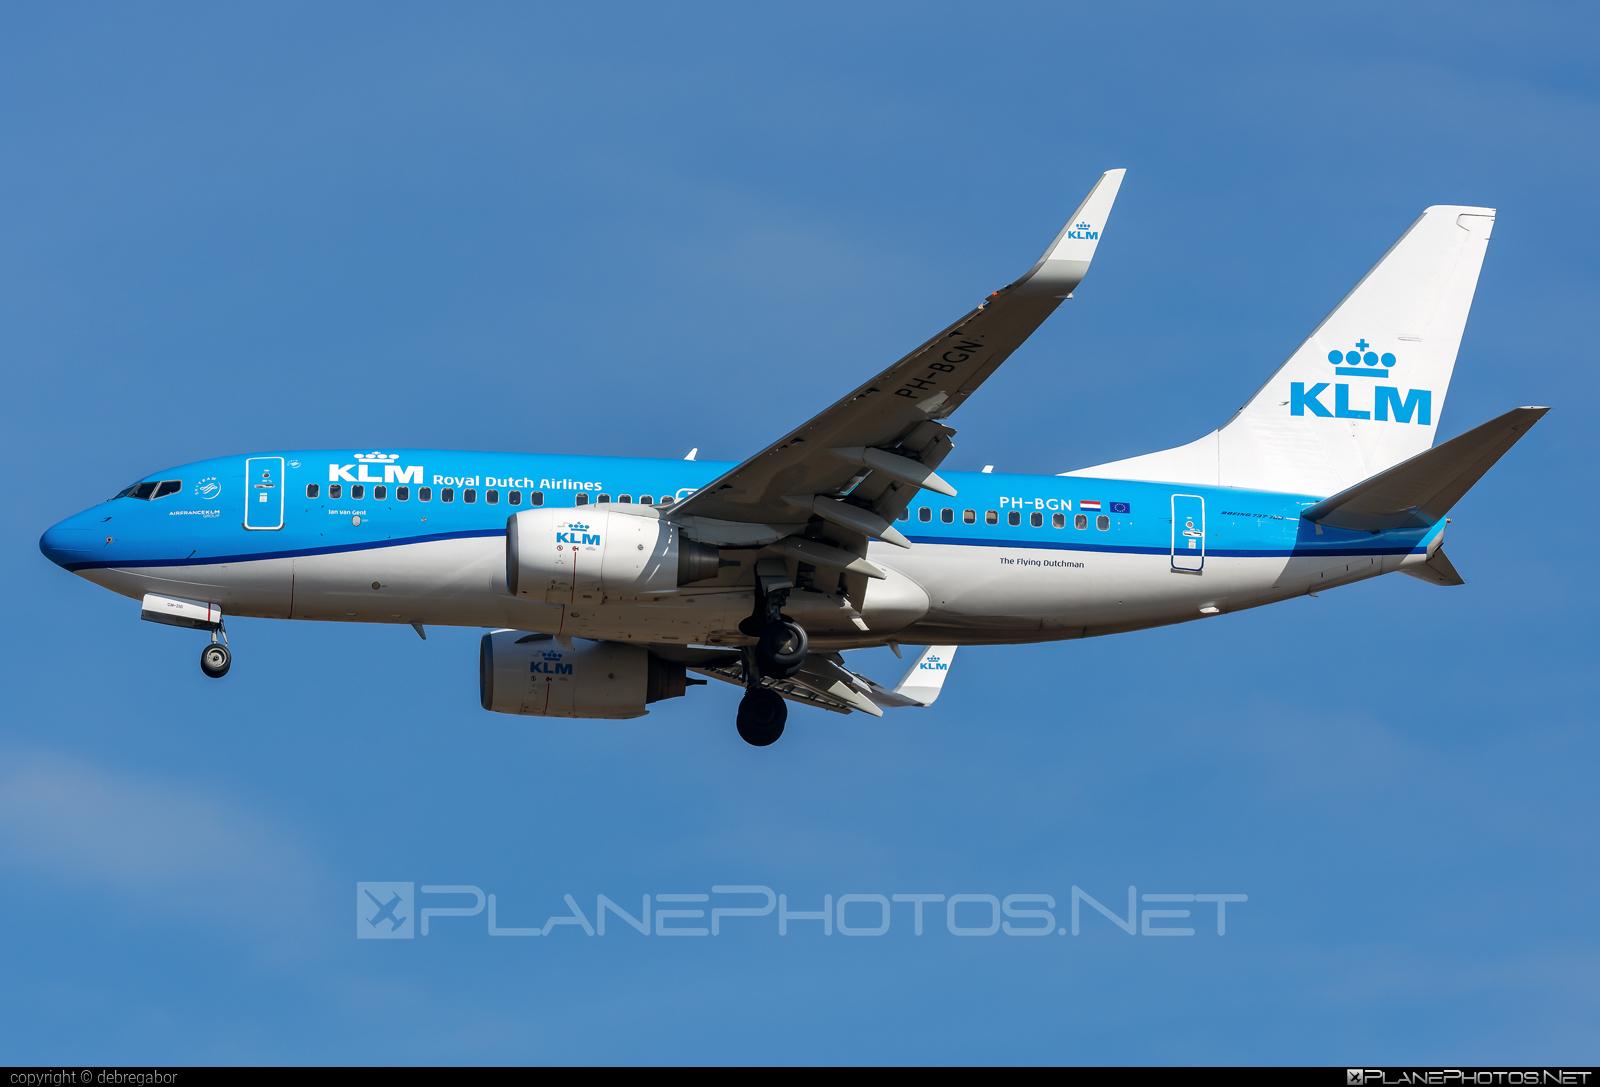 Boeing 737-700 - PH-BGN operated by KLM Royal Dutch Airlines #b737 #b737nextgen #b737ng #boeing #boeing737 #klm #klmroyaldutchairlines #royaldutchairlines